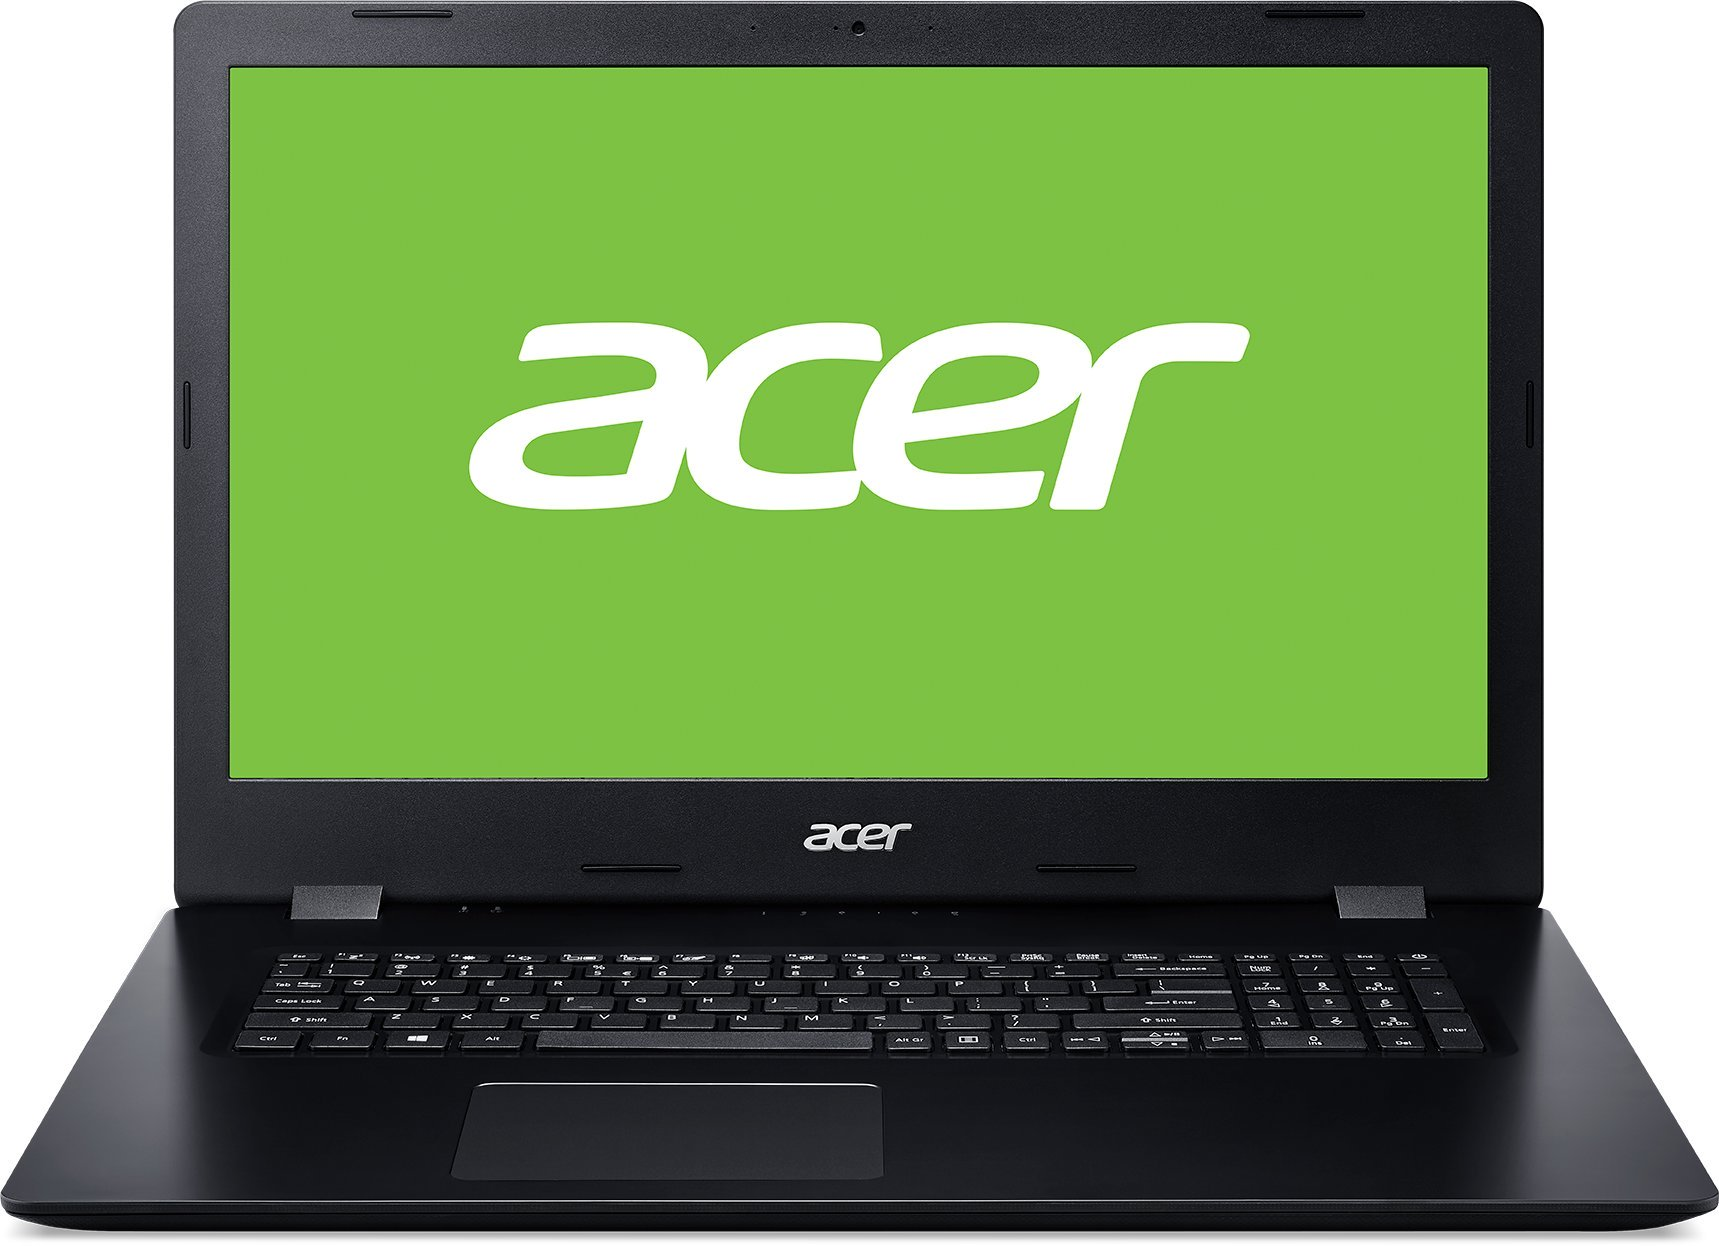 Acer Aspire 3 A317-51-76Z4